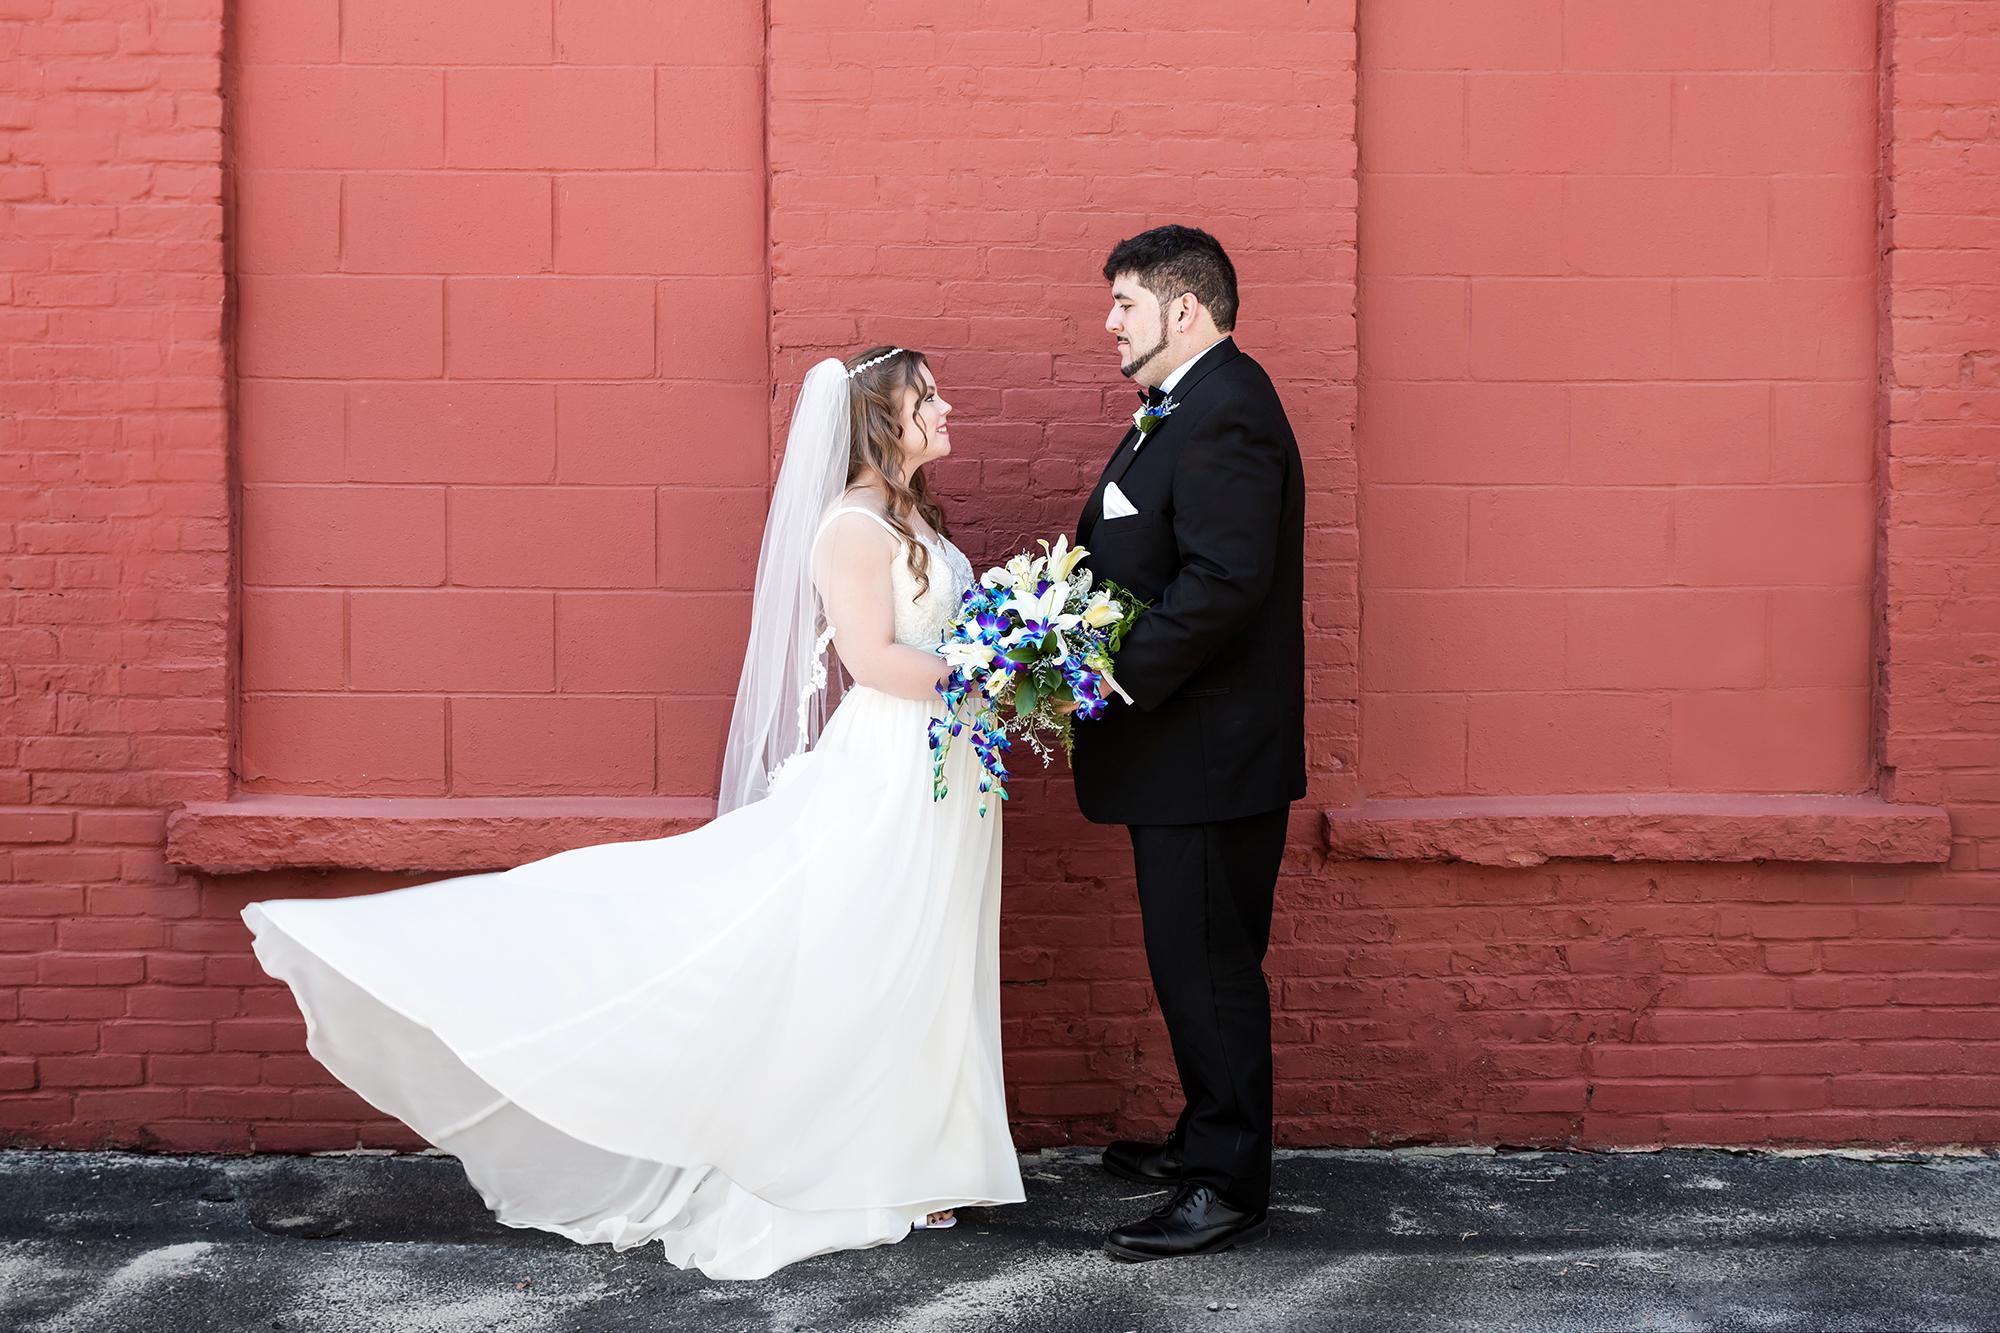 Wedding Photography Makeup Artist